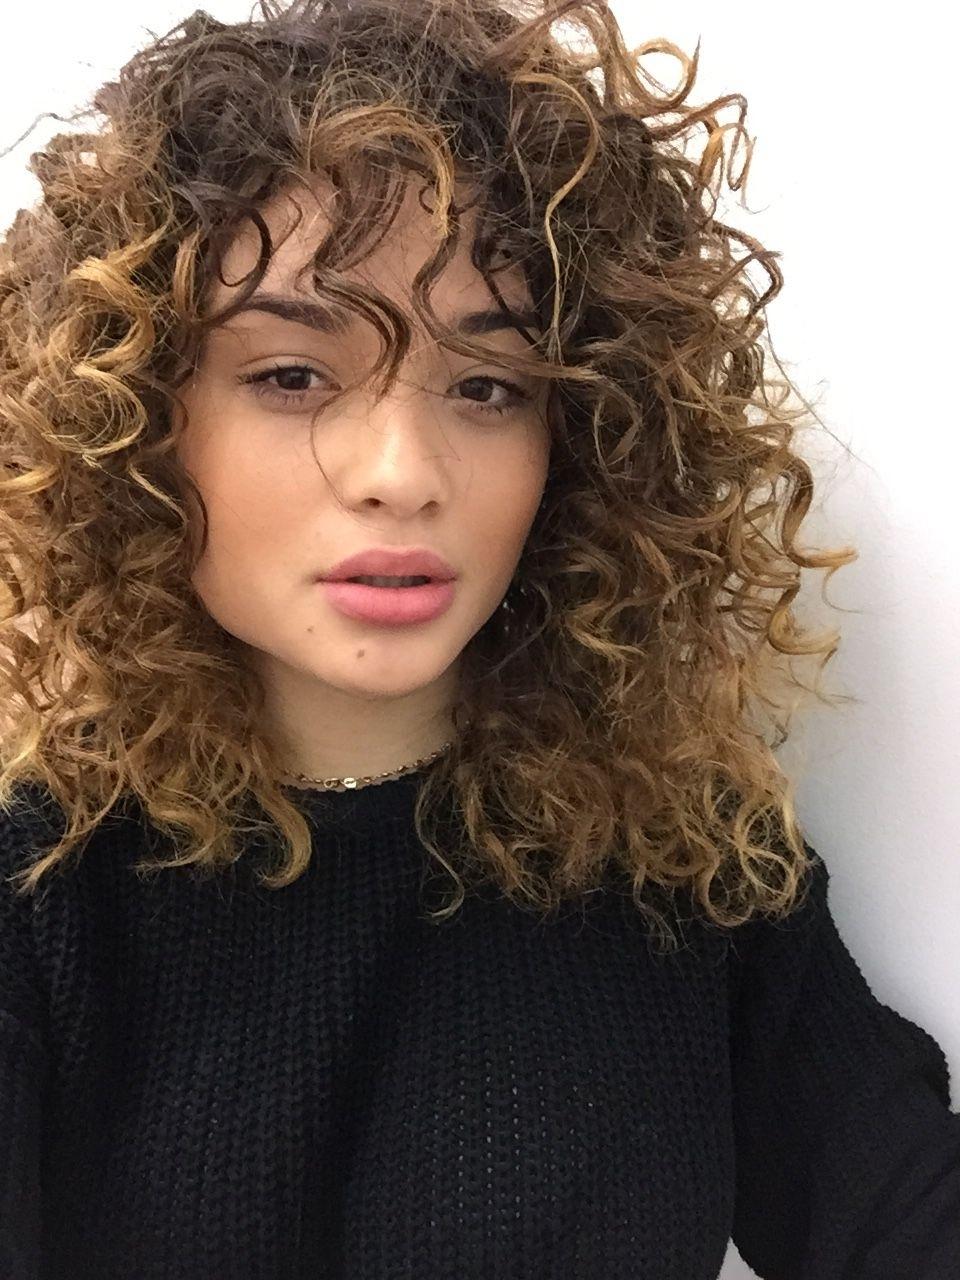 Feminist Barbie | Humans | Pinterest | Curly, Haircuts And Bangs for Haircuts For Curly Hair With Bangs